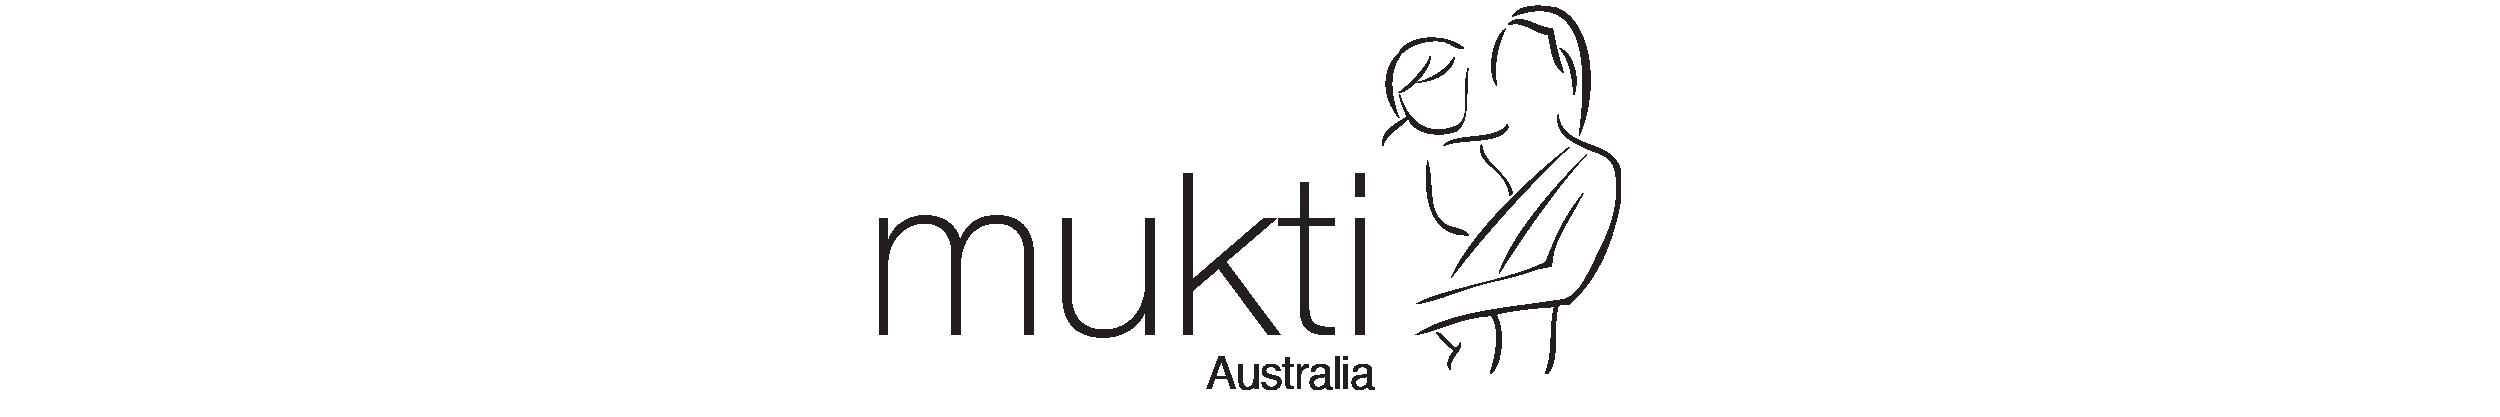 Mukti Australia Merchandise